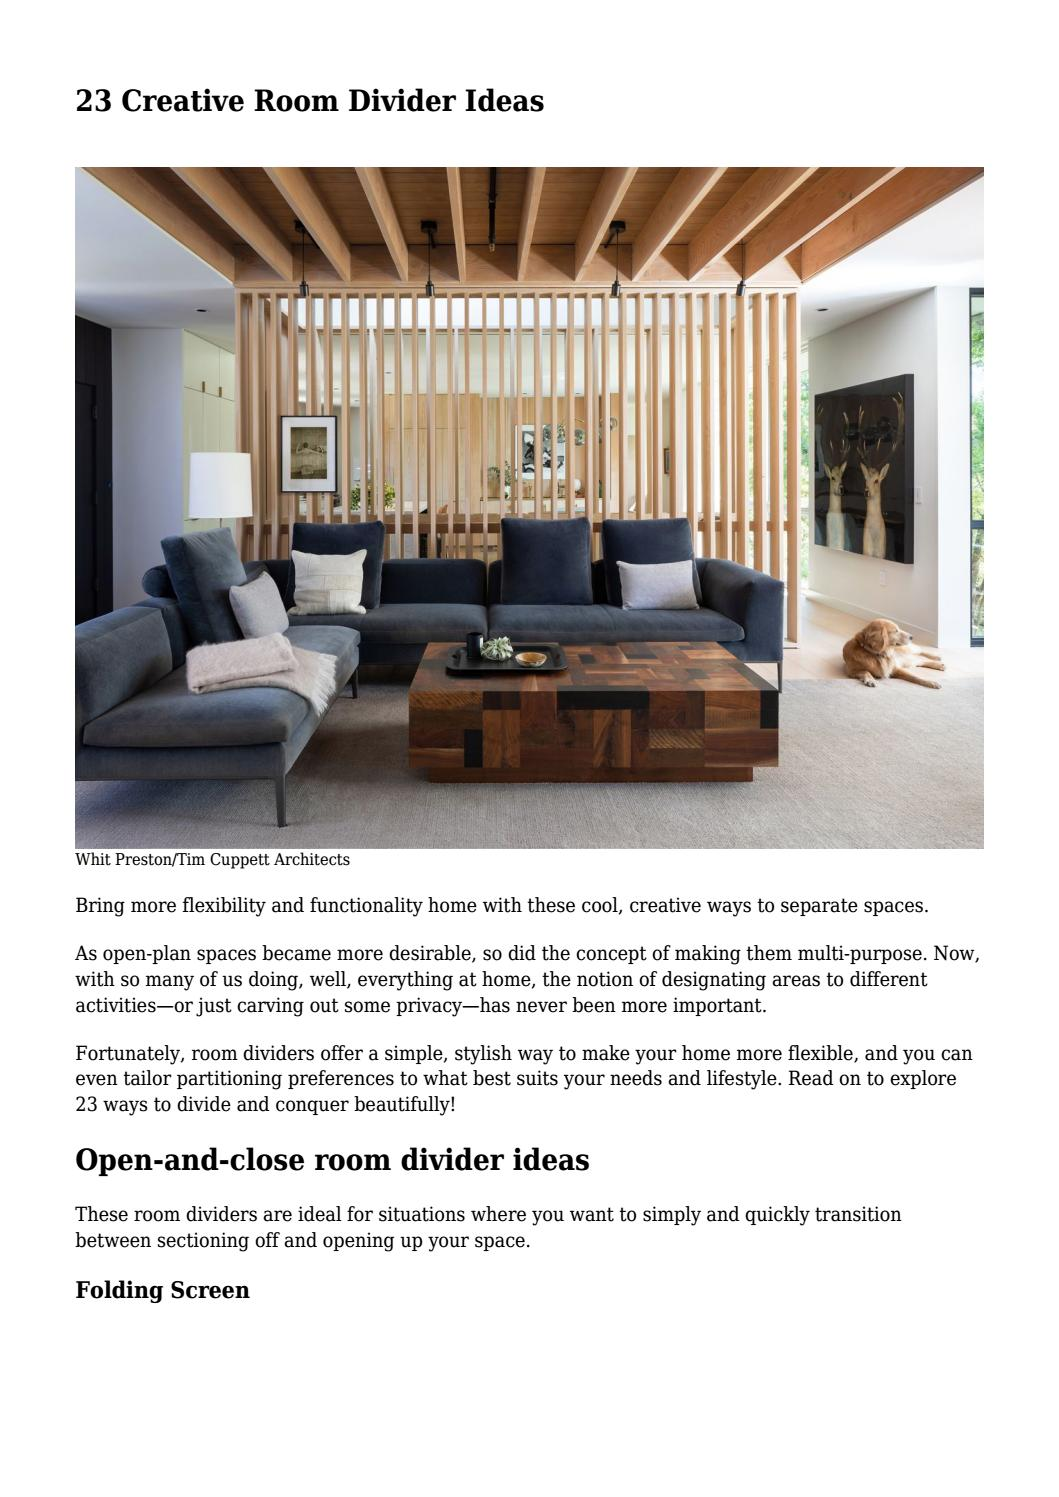 23 Creative Room Divider Ideas By Louisrowan8521 Issuu